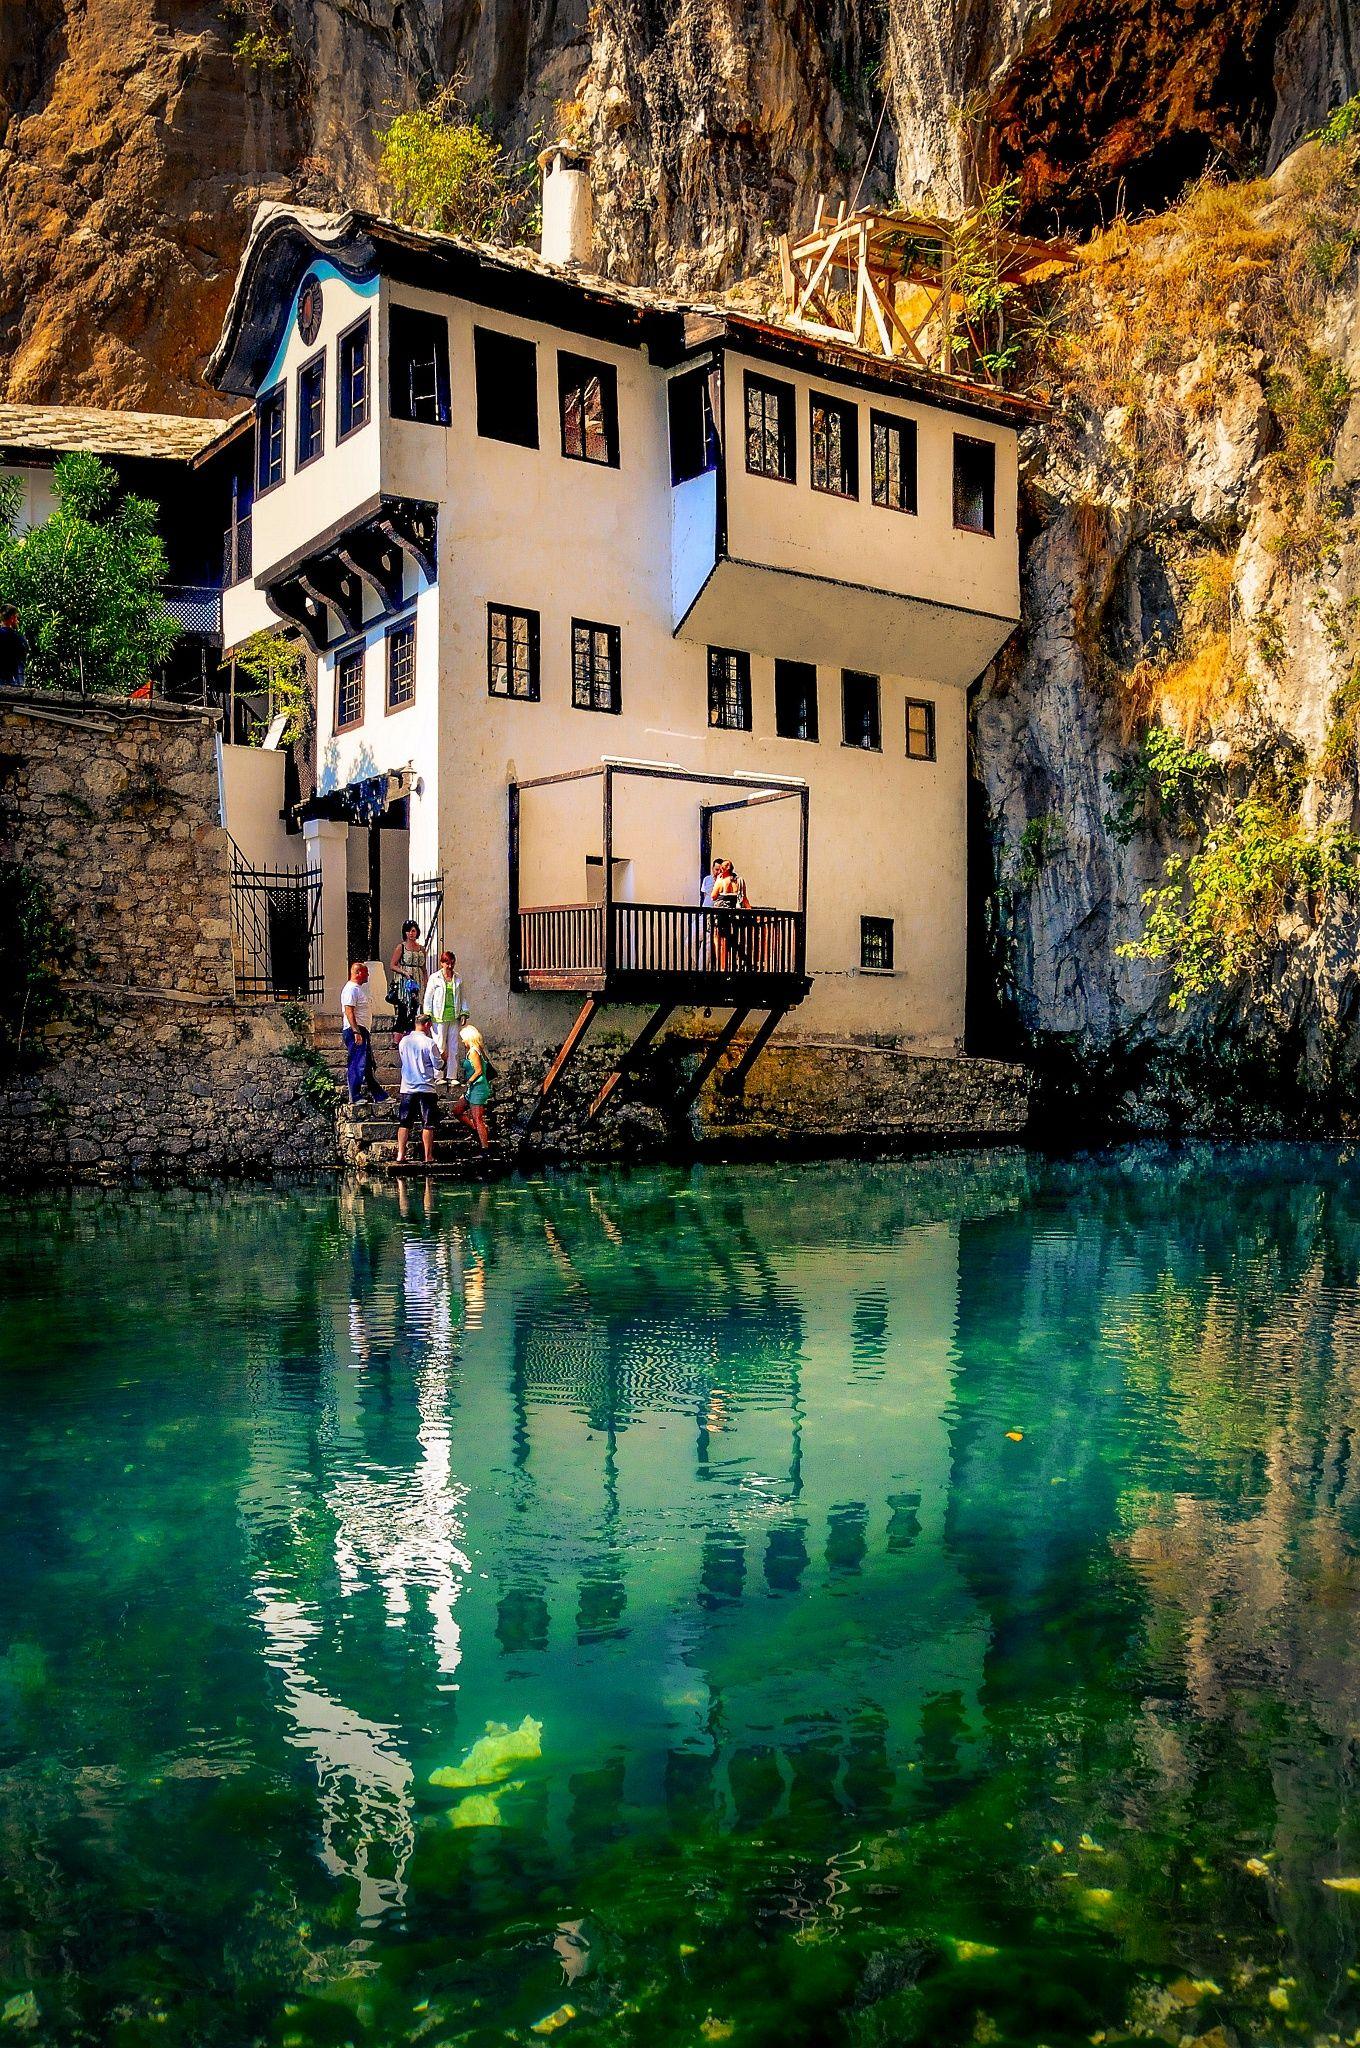 Bosnia-dervish monastery by Emir Terovic on 500px